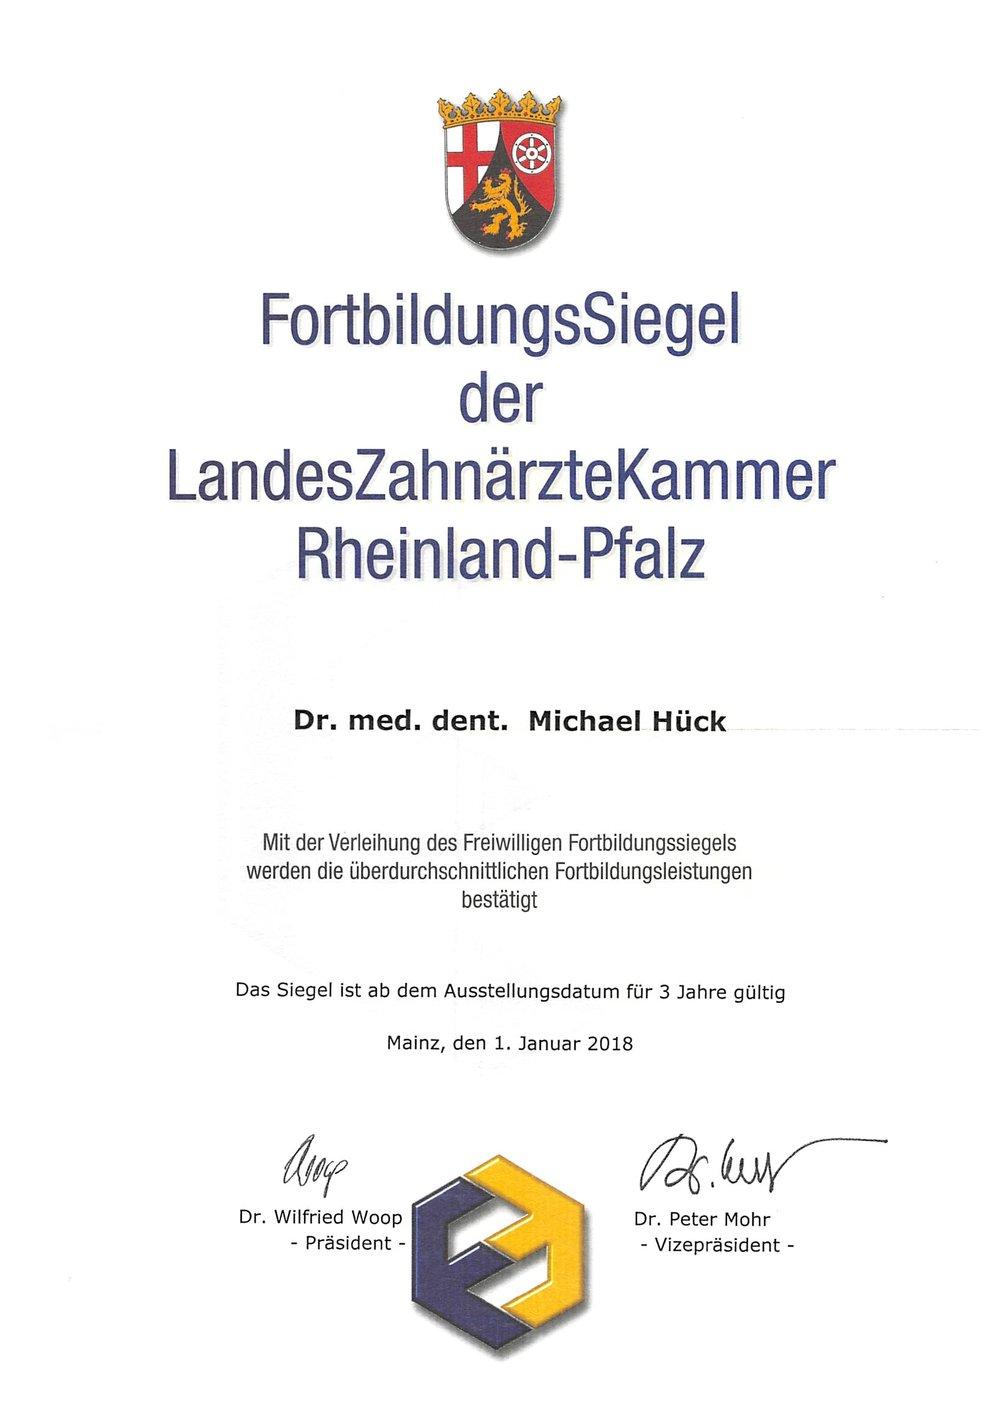 Fortbildungssiegel Michael Hück.jpg